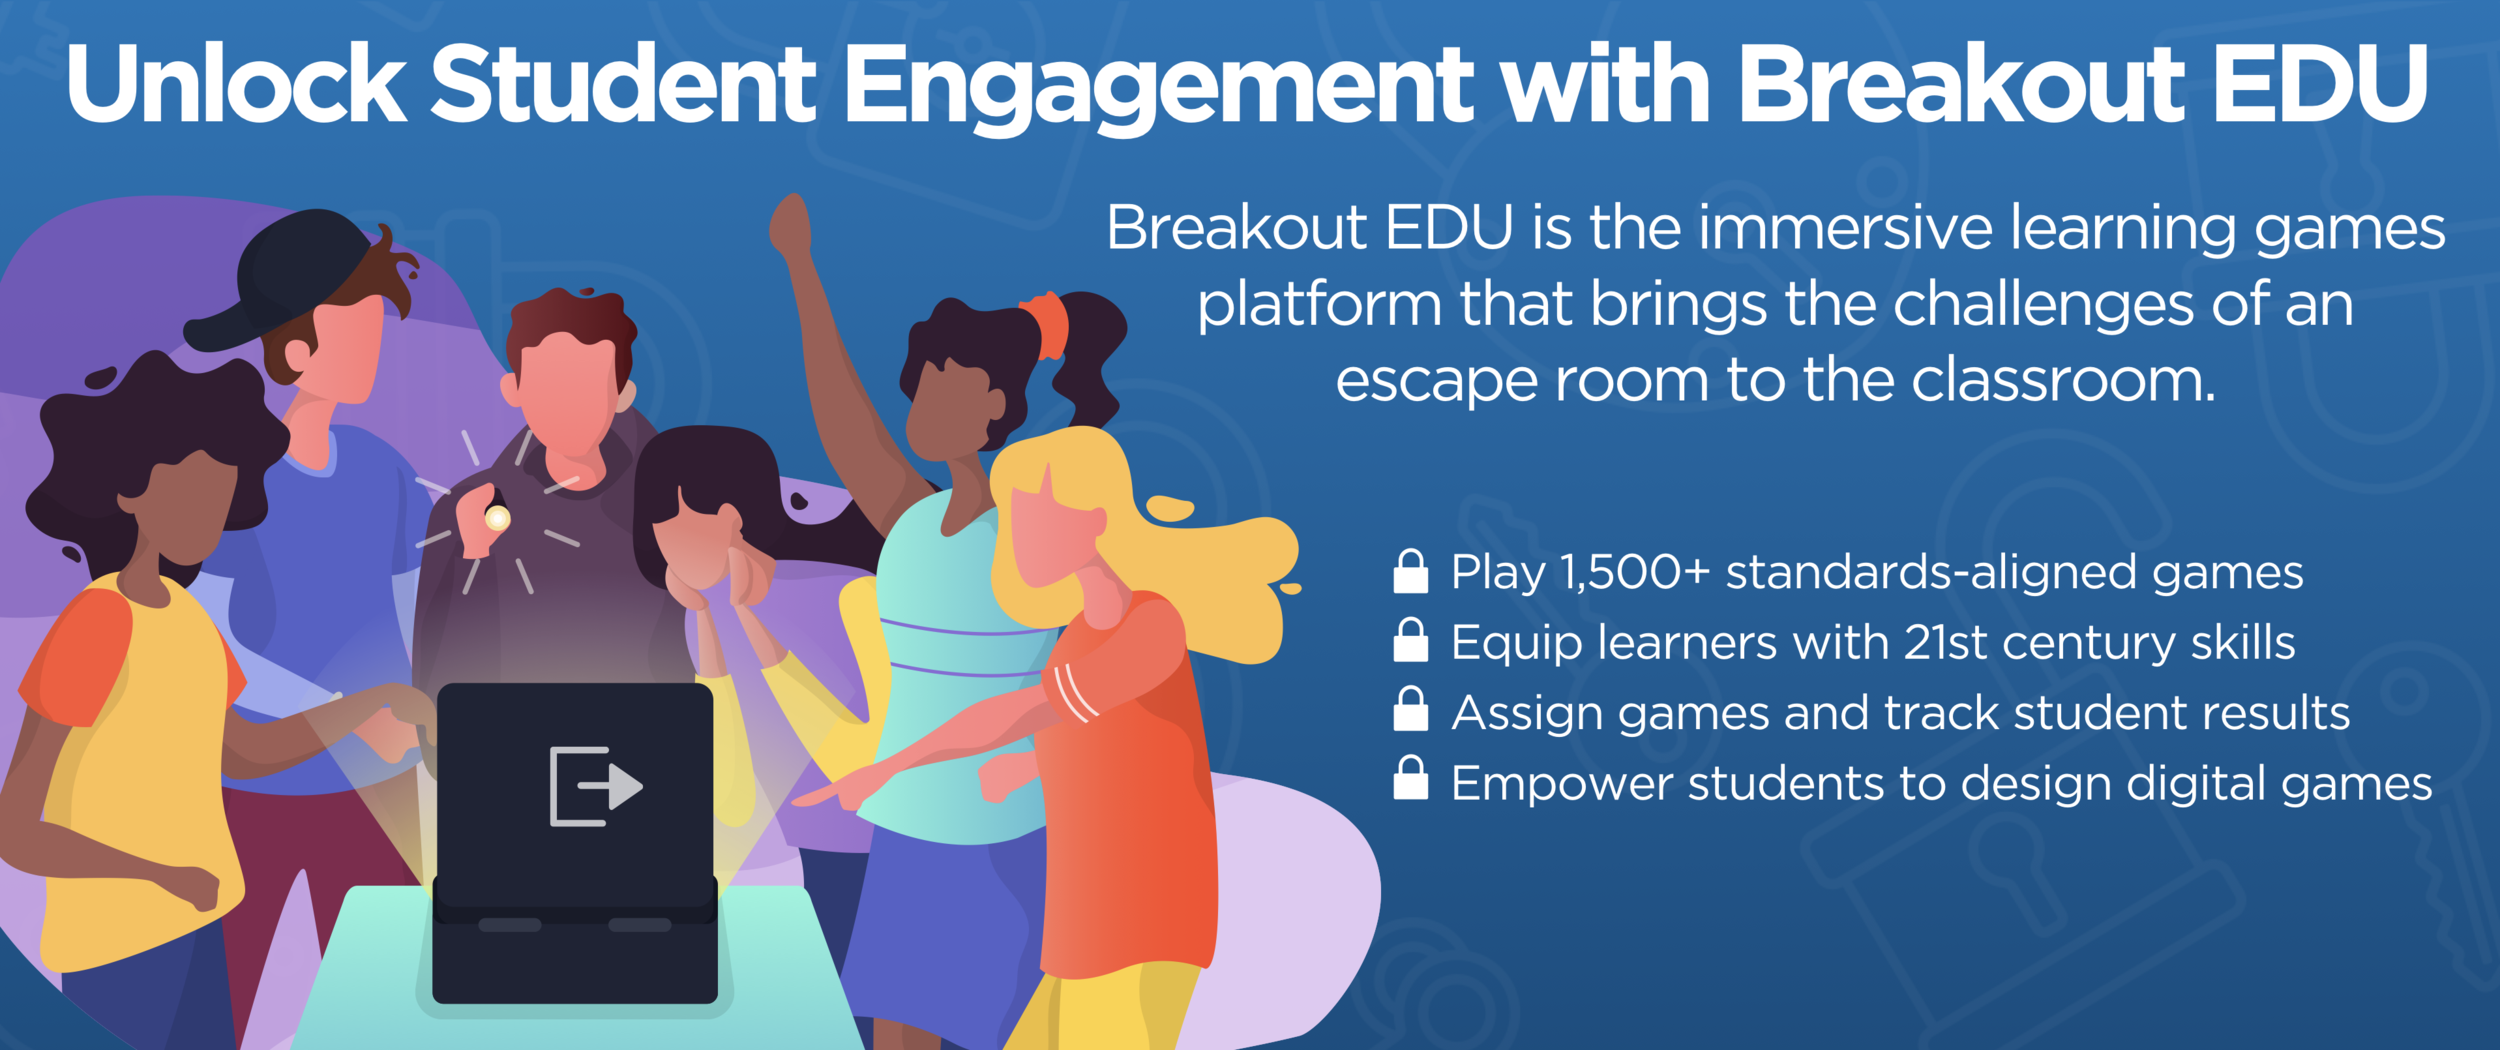 Unlock Student Engagement with Breakout EDU